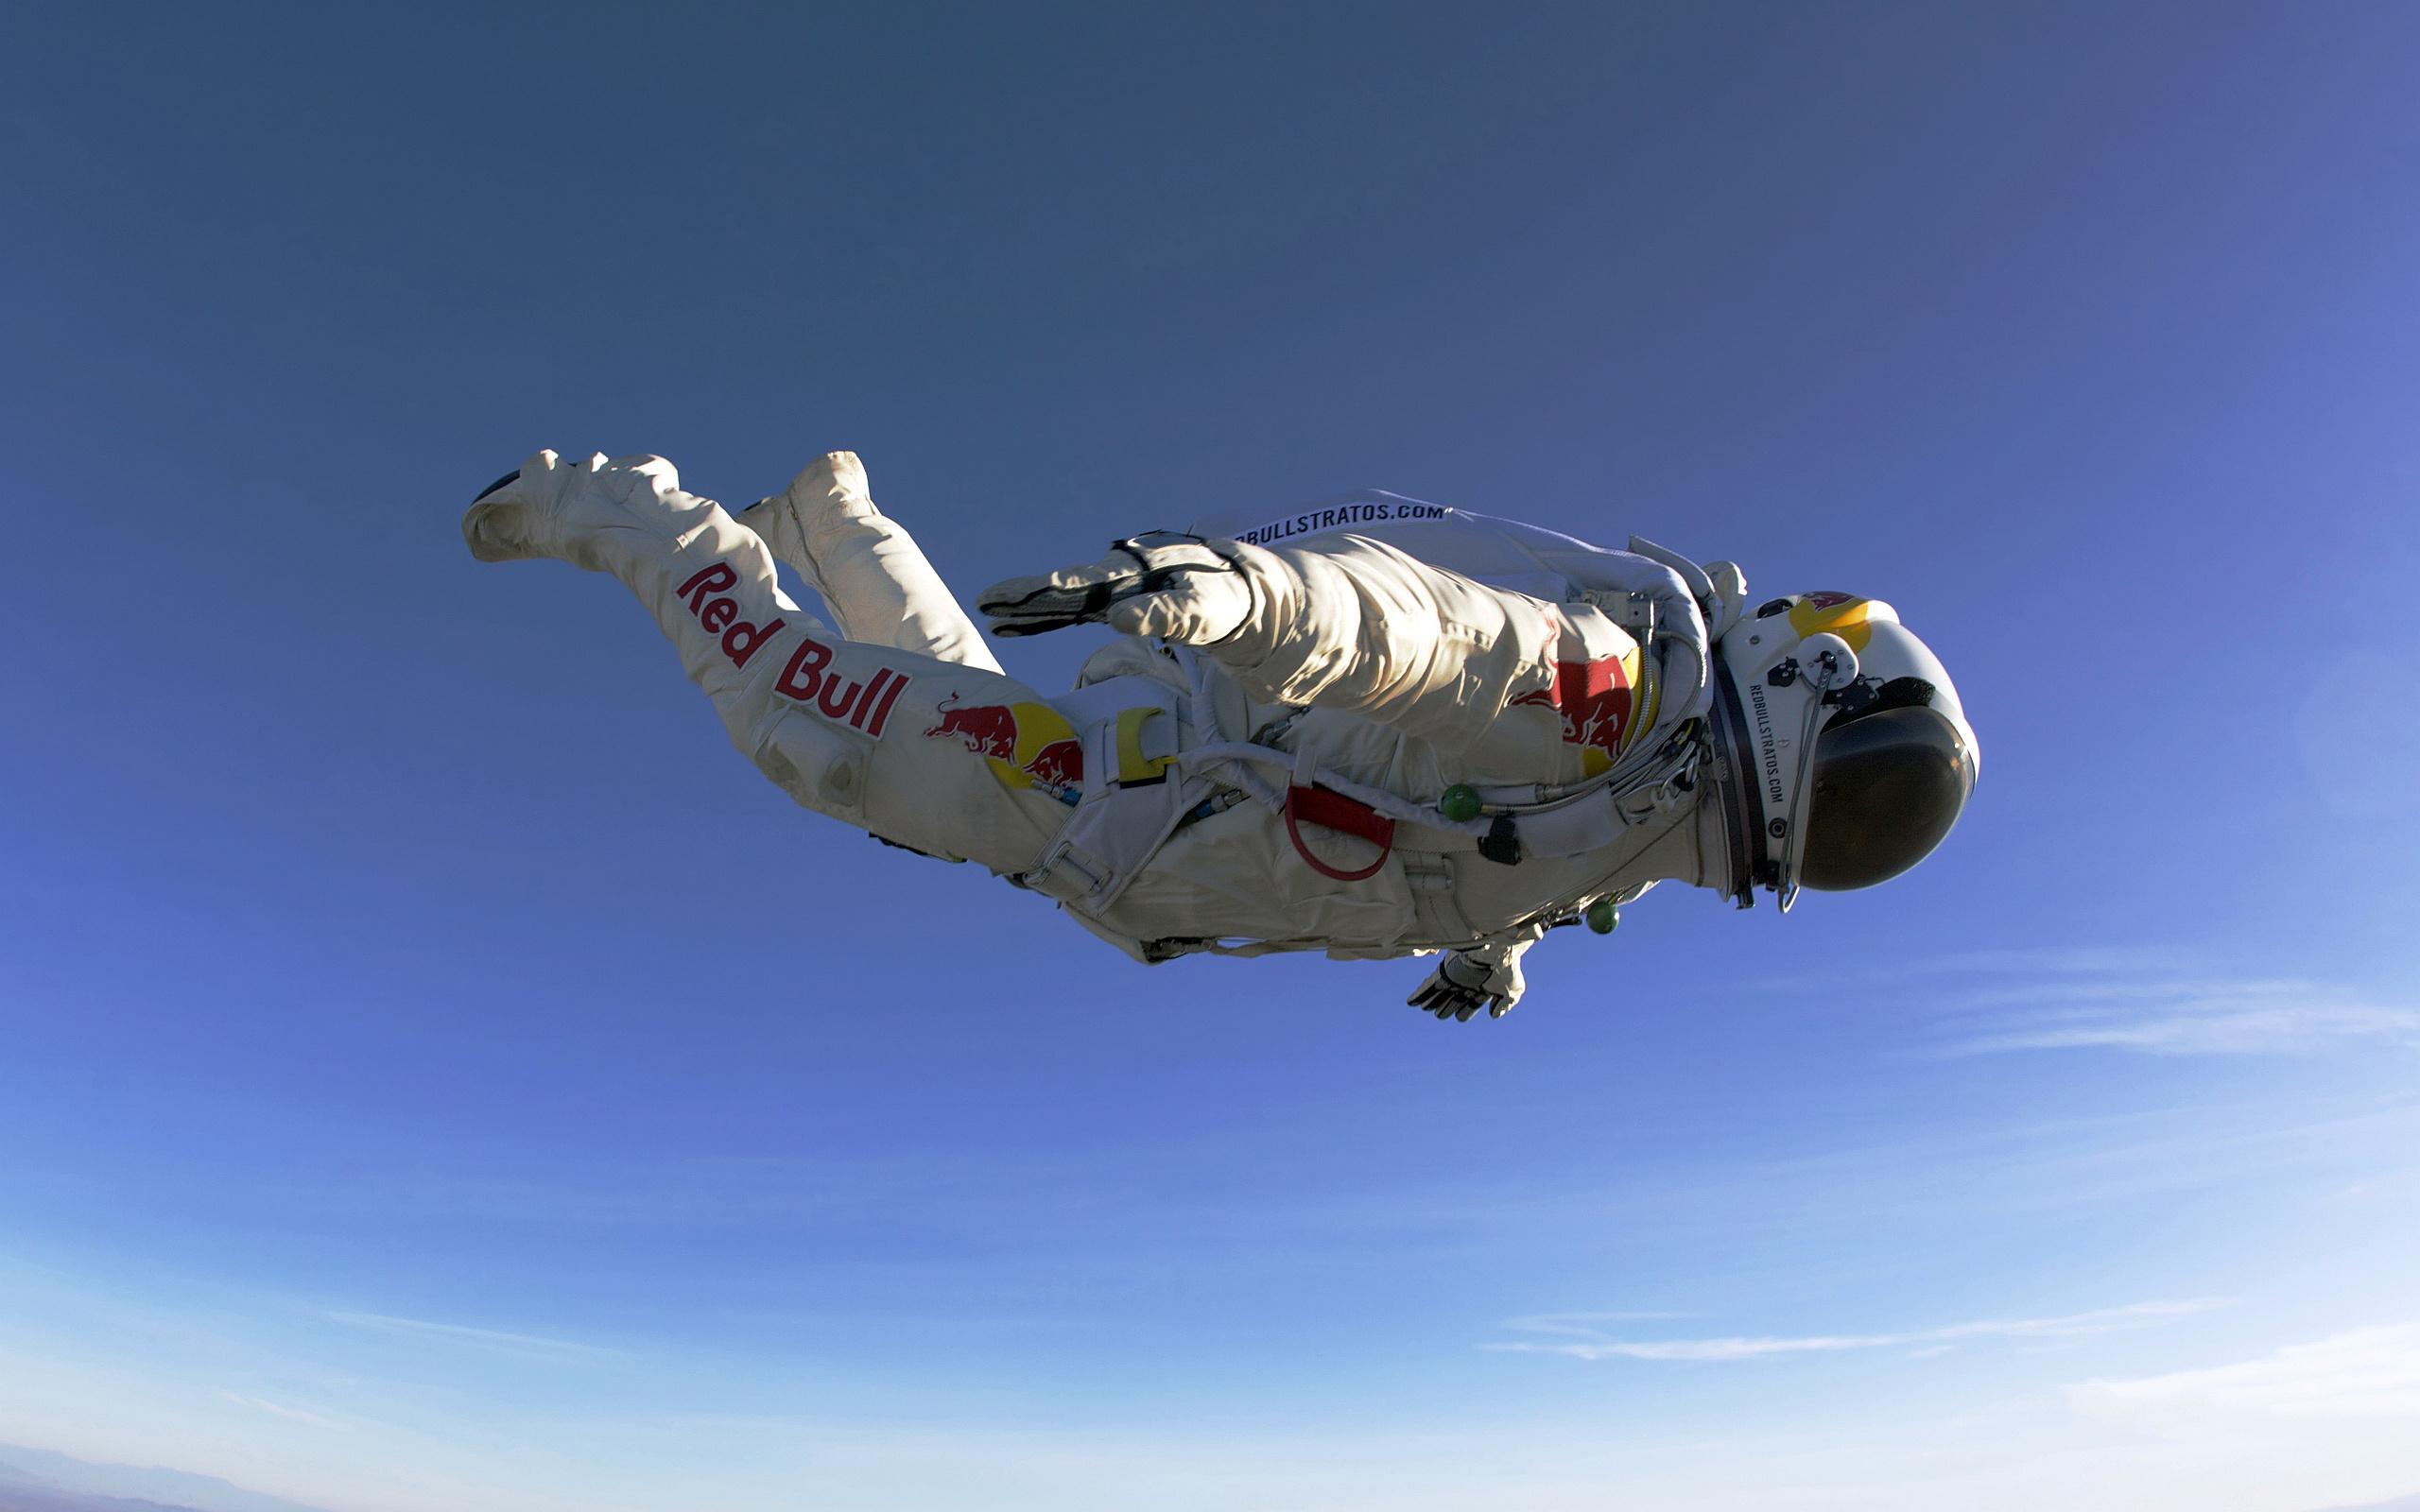 Felix Baumgartner Free Fall